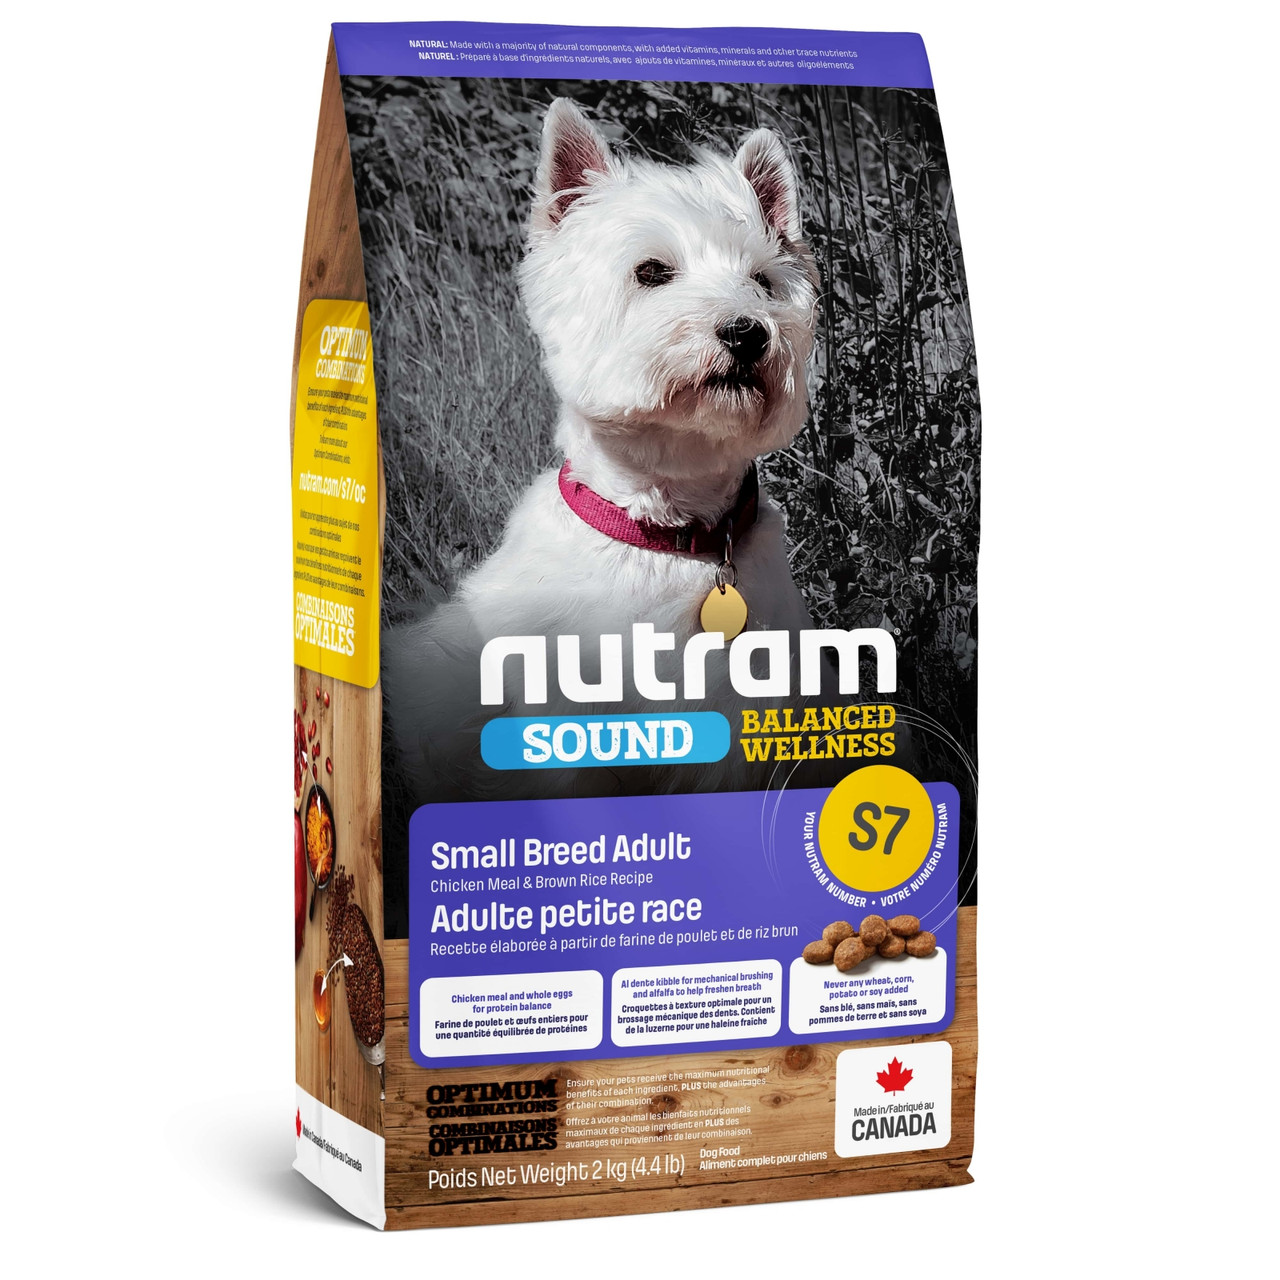 Nutram (Нутрам) S7 Sound Balanced Wellness Small Breed Adult Dog сухой корм для собак мелких пород, 20 кг